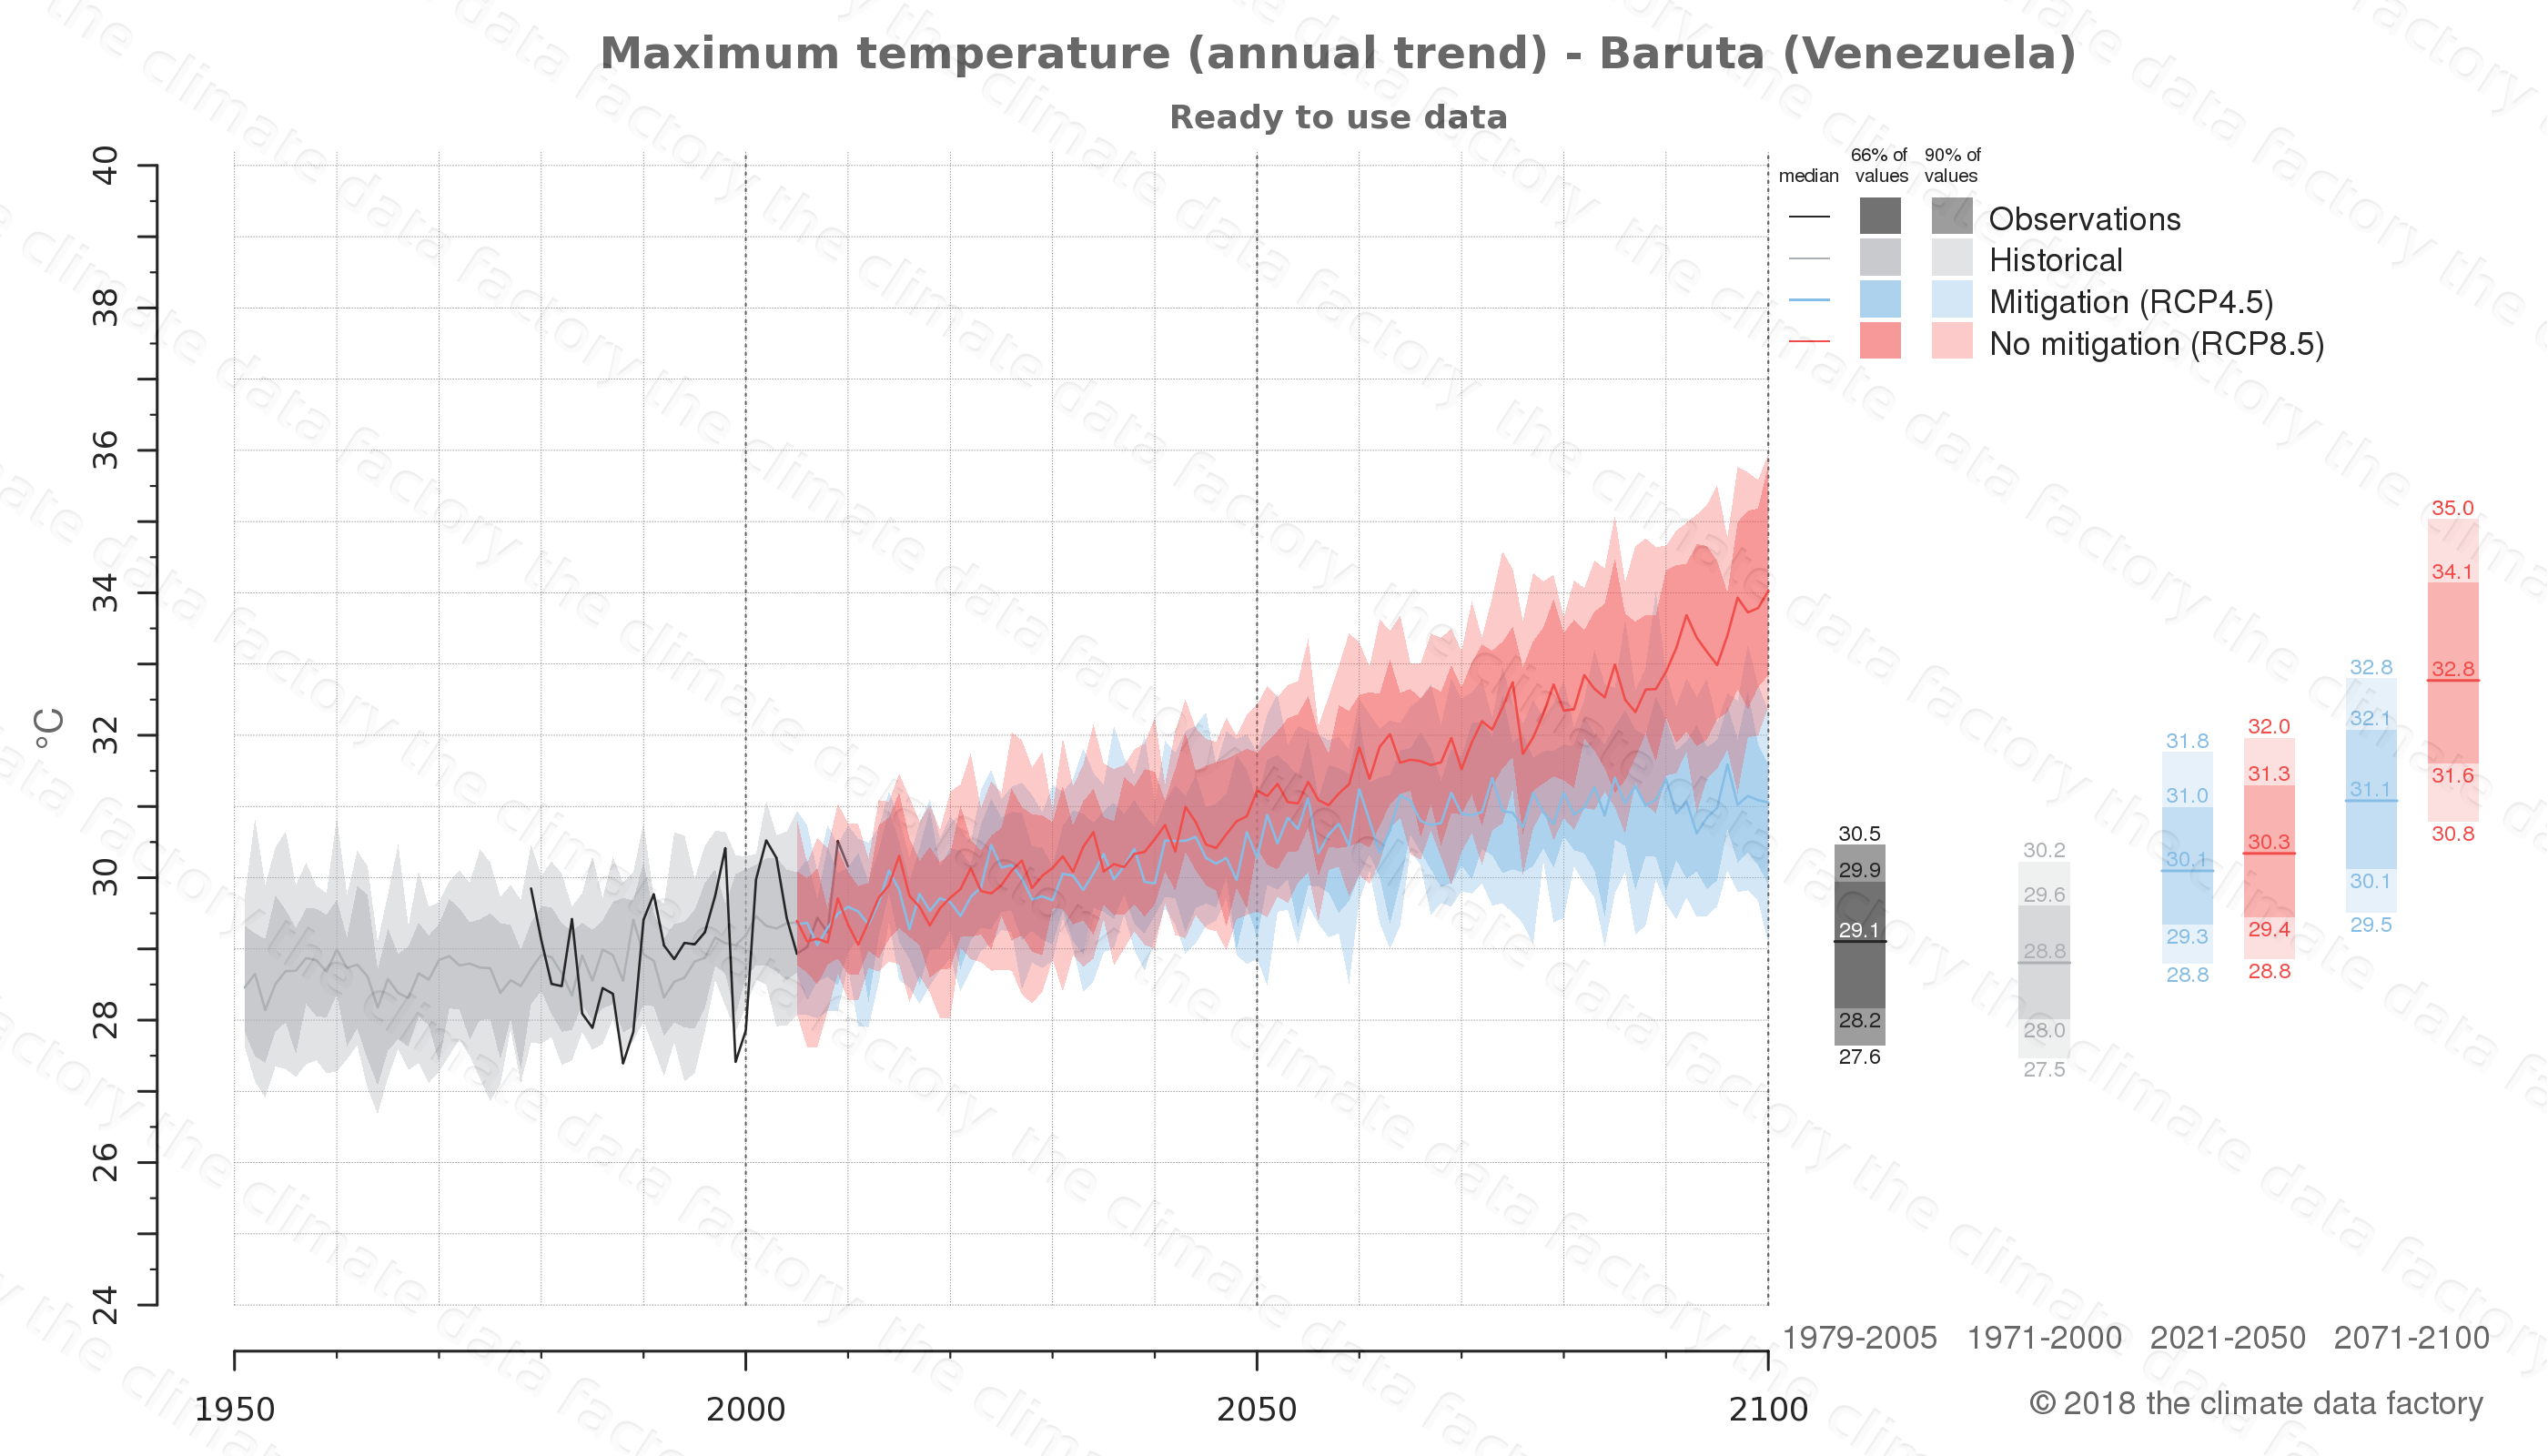 climate change data policy adaptation climate graph city data maximum-temperature baruta venezuela